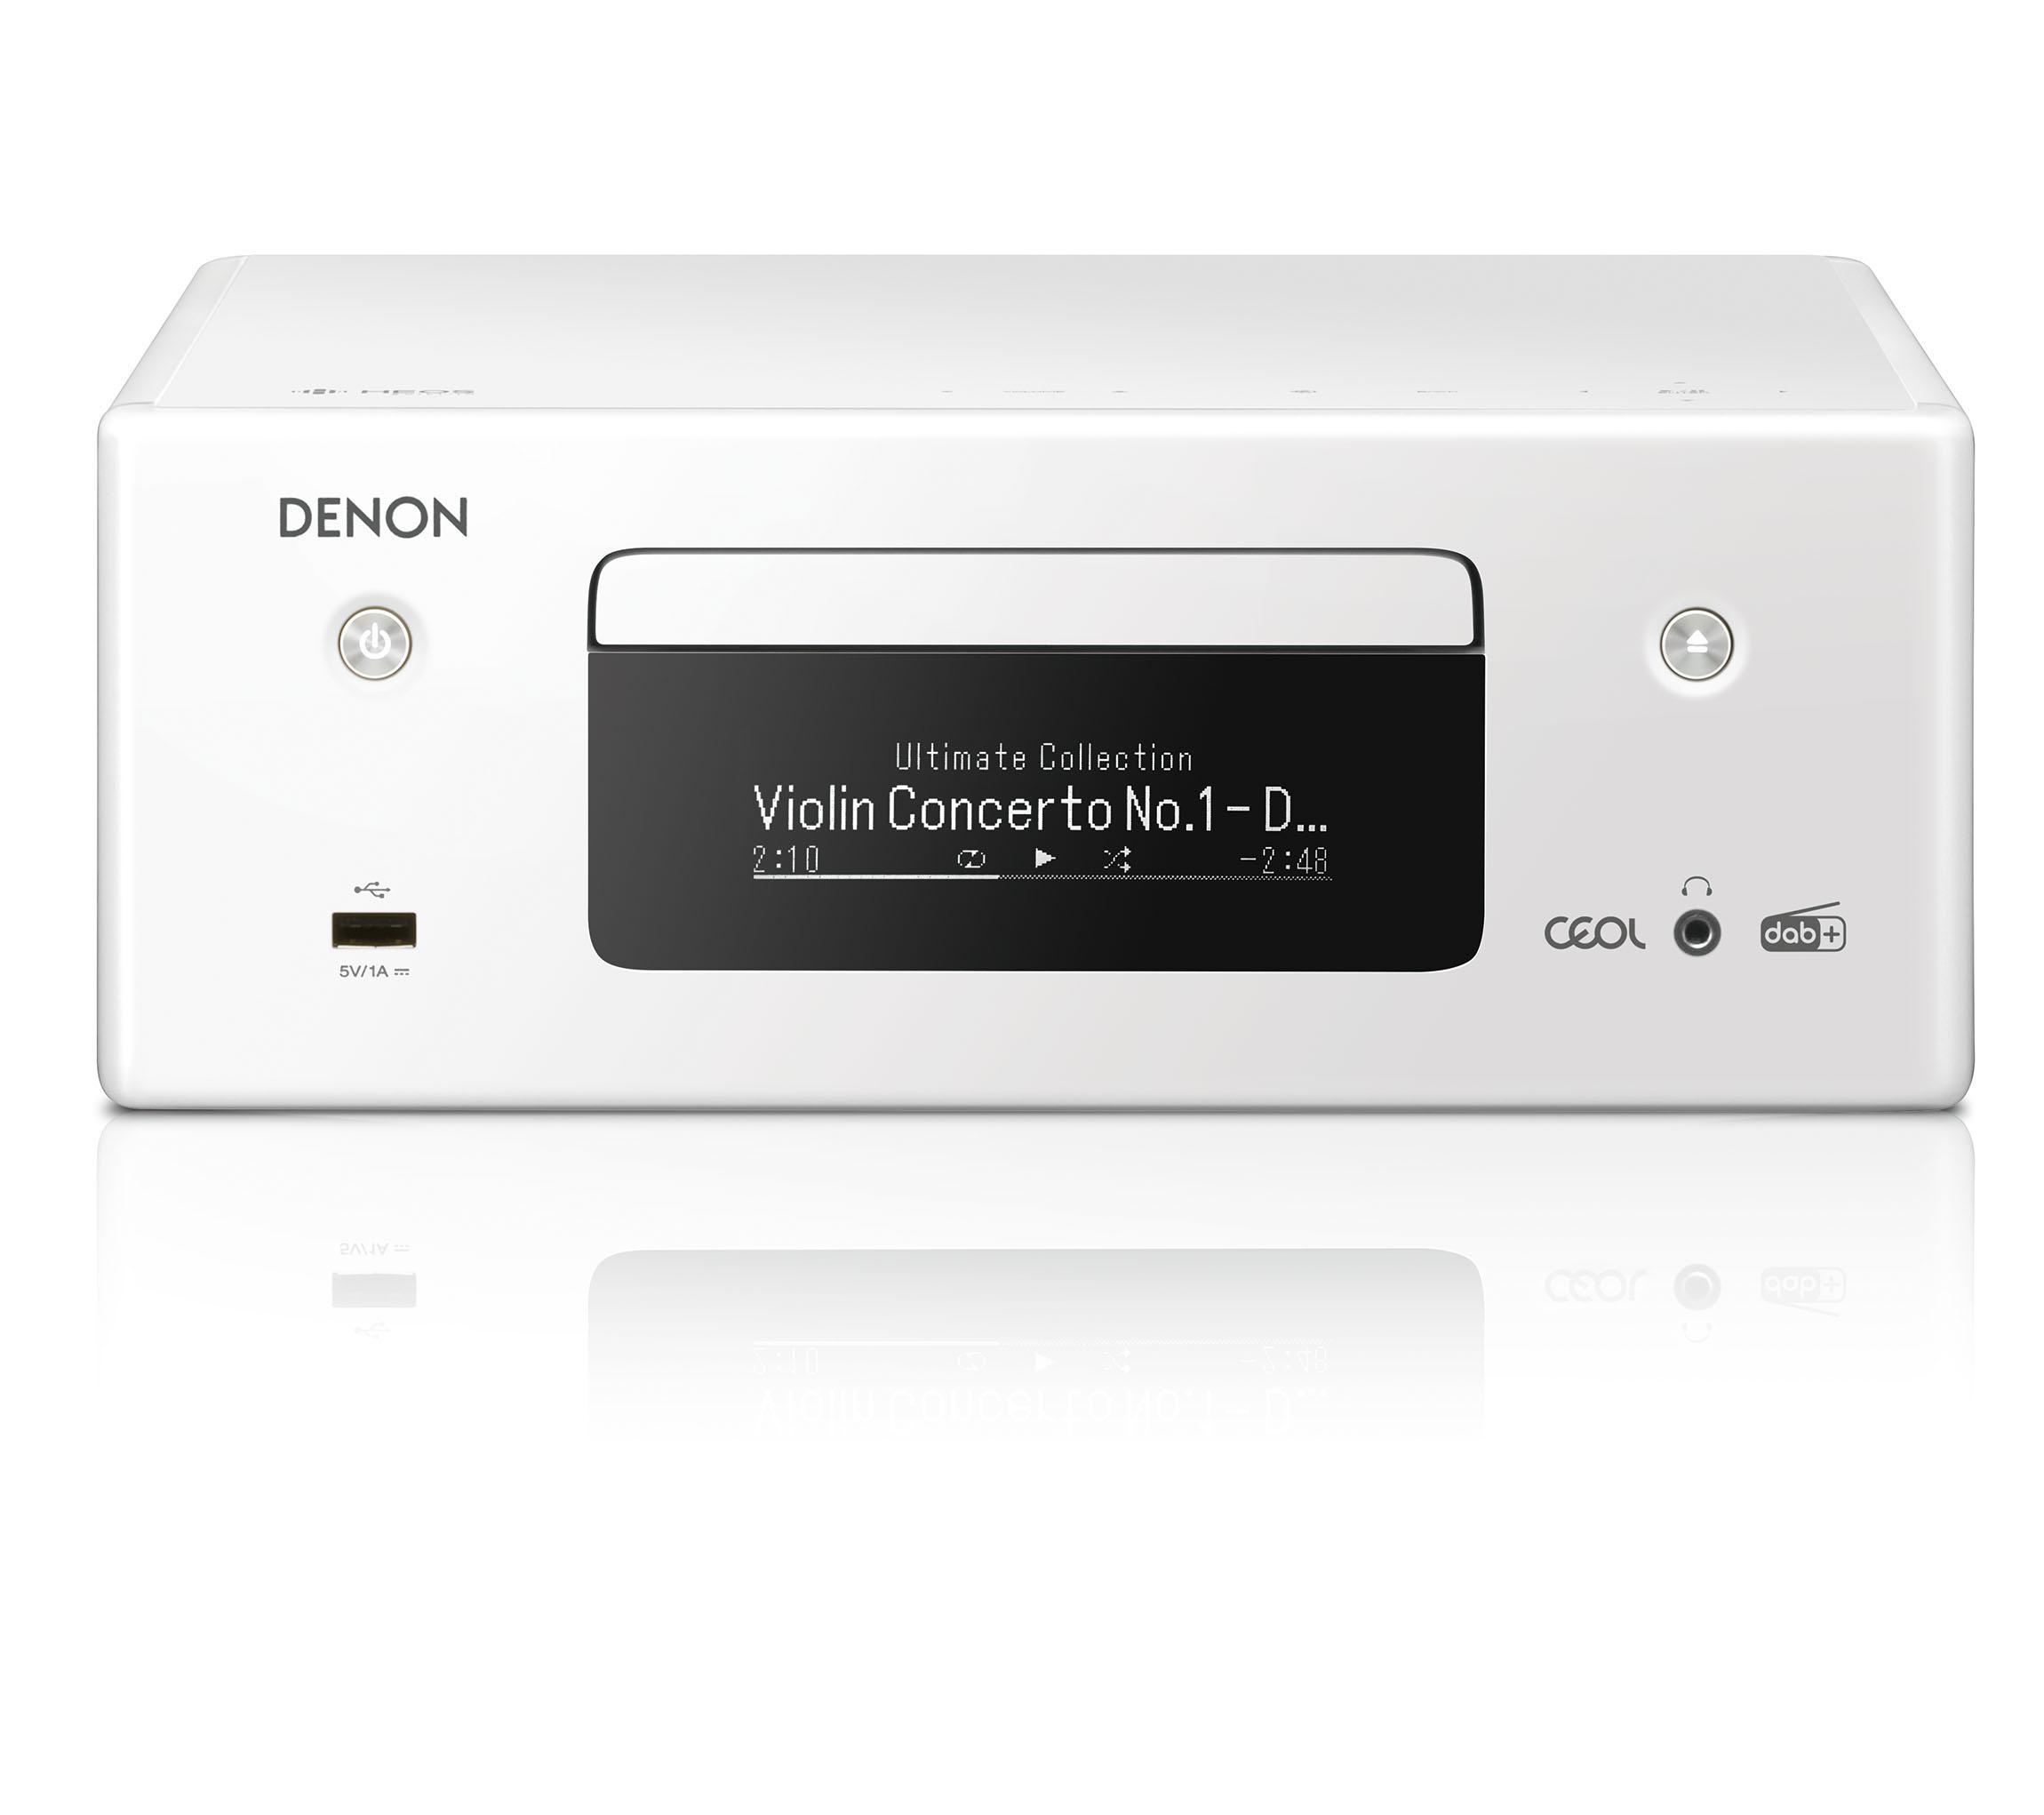 Denon RCD-N 11DAB weiss Netzwerk-CD-Receiver 101284